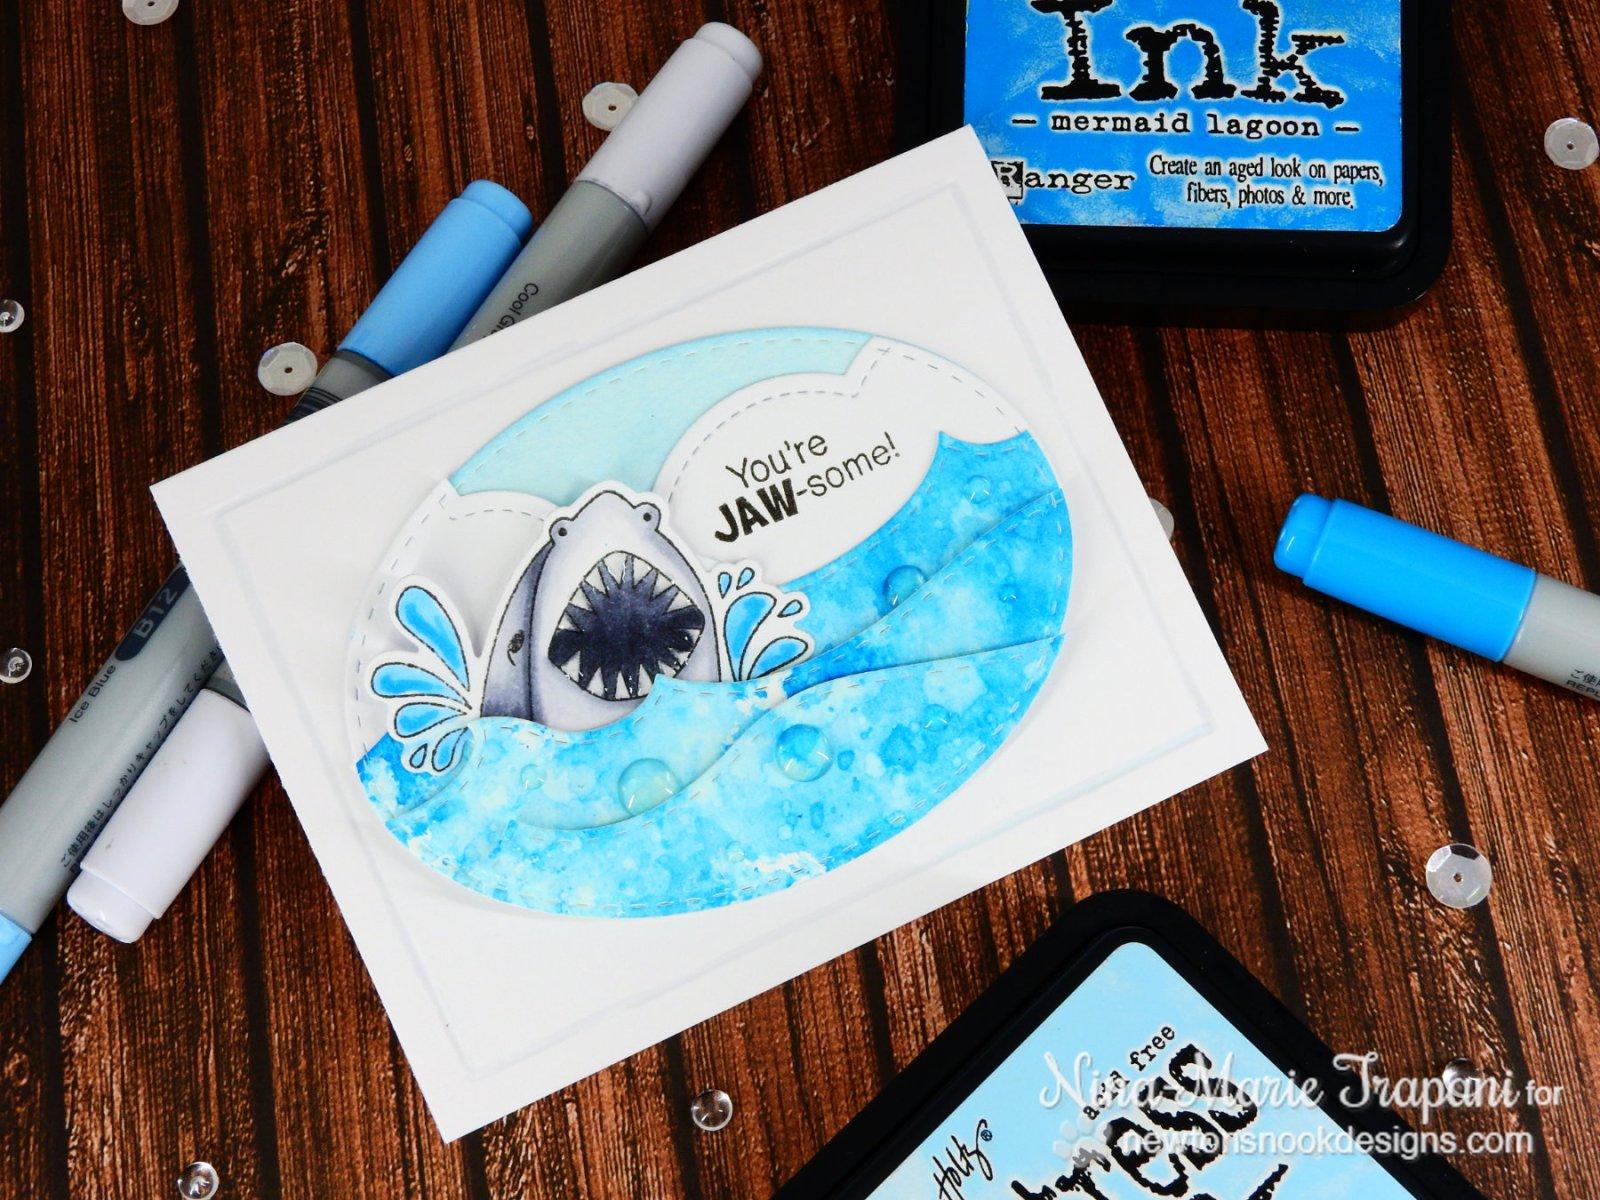 Creating Water + Shark Week_2